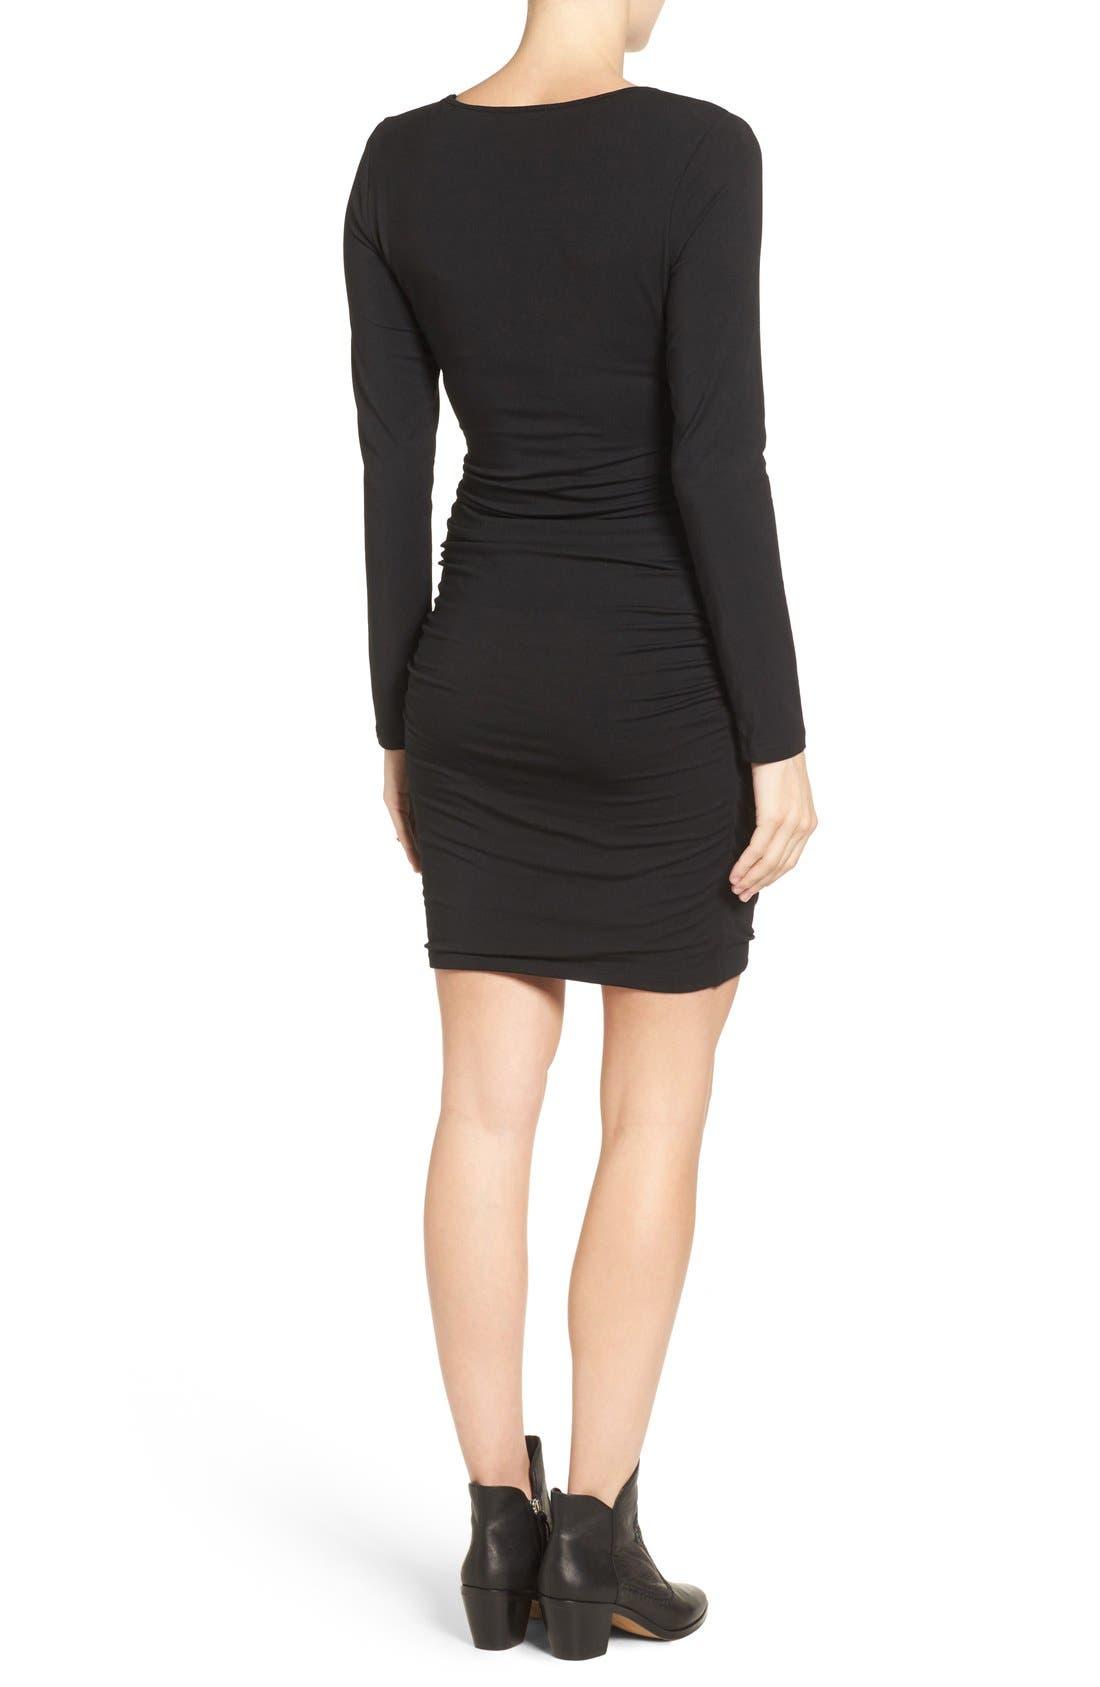 TART MATERNITY, Tart 'Peaches' Maternity Body-Con Dress, Main thumbnail 1, color, BLACK